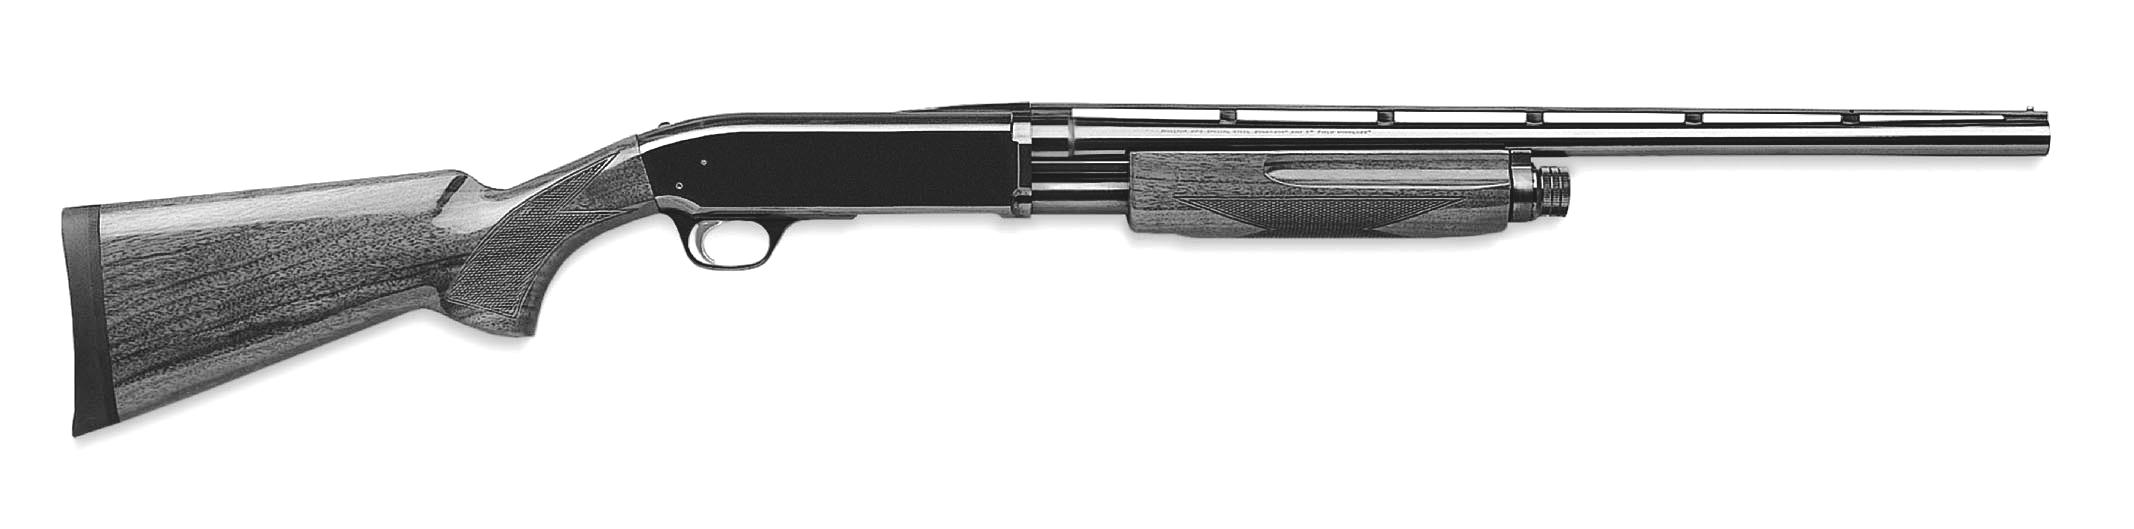 BPS Micro 20 Gauge